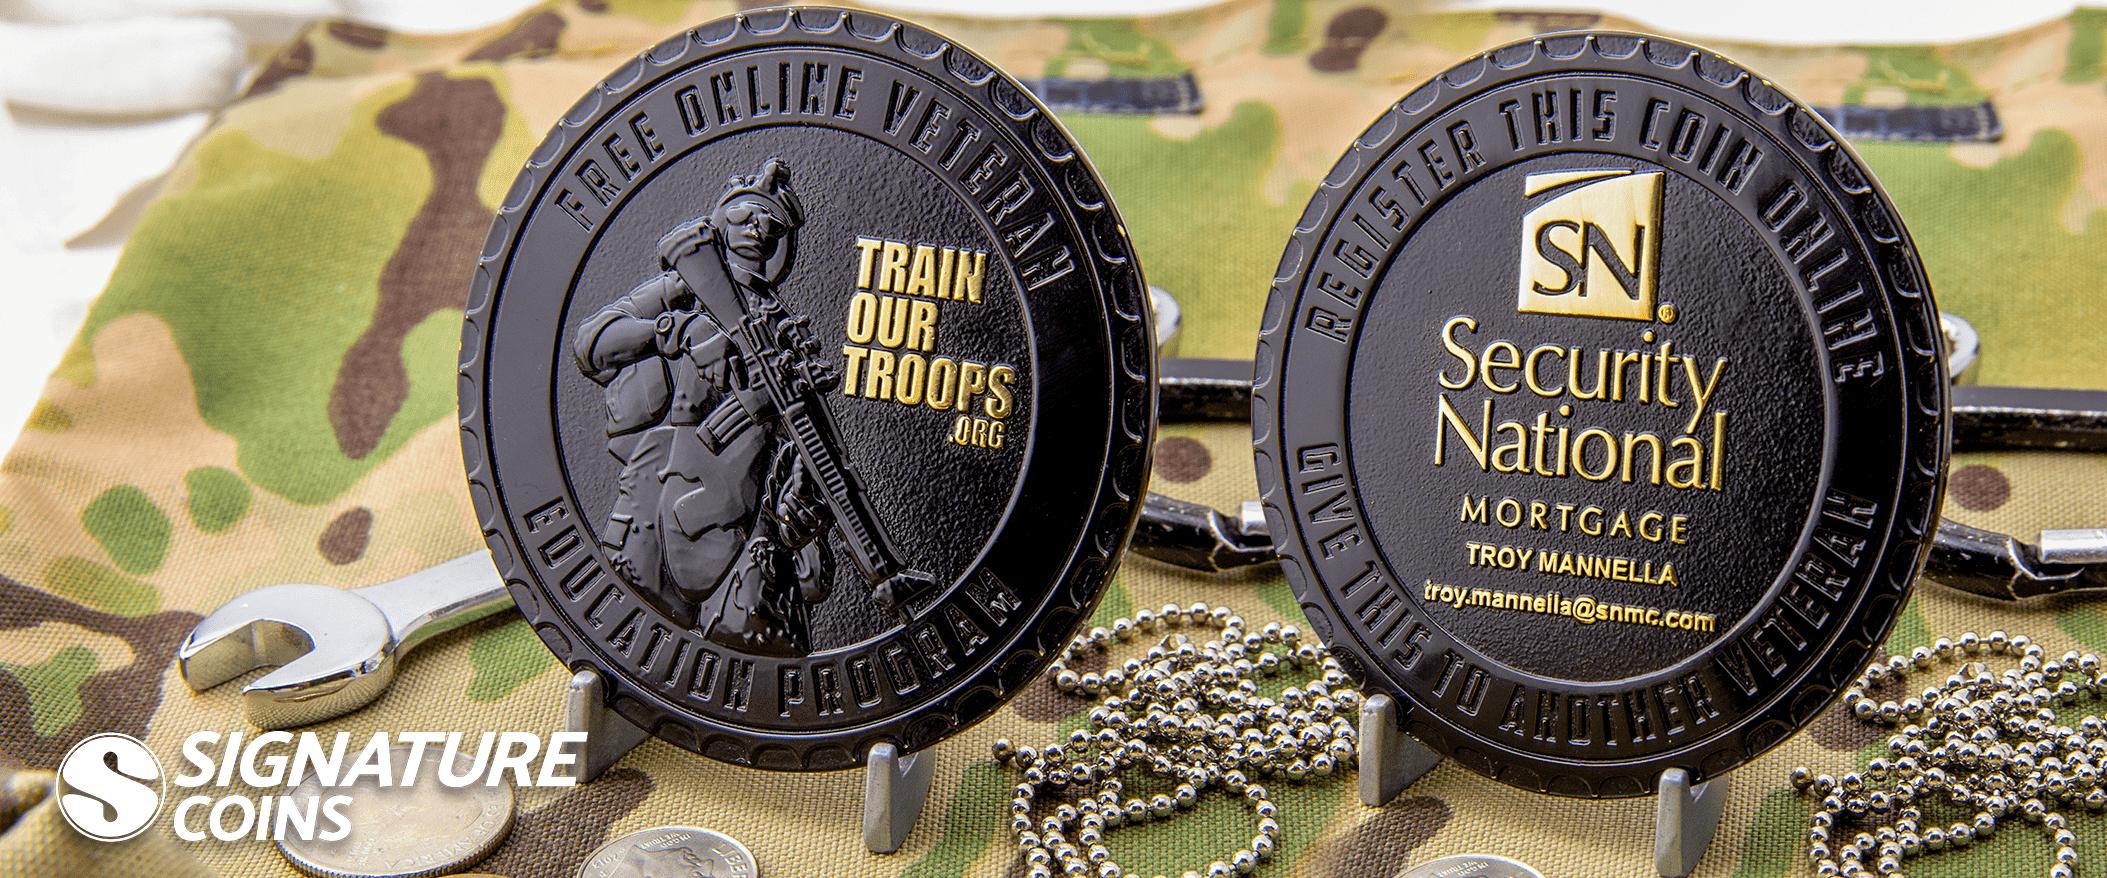 Best Custom Challenge Coin Maker - Signature Coins